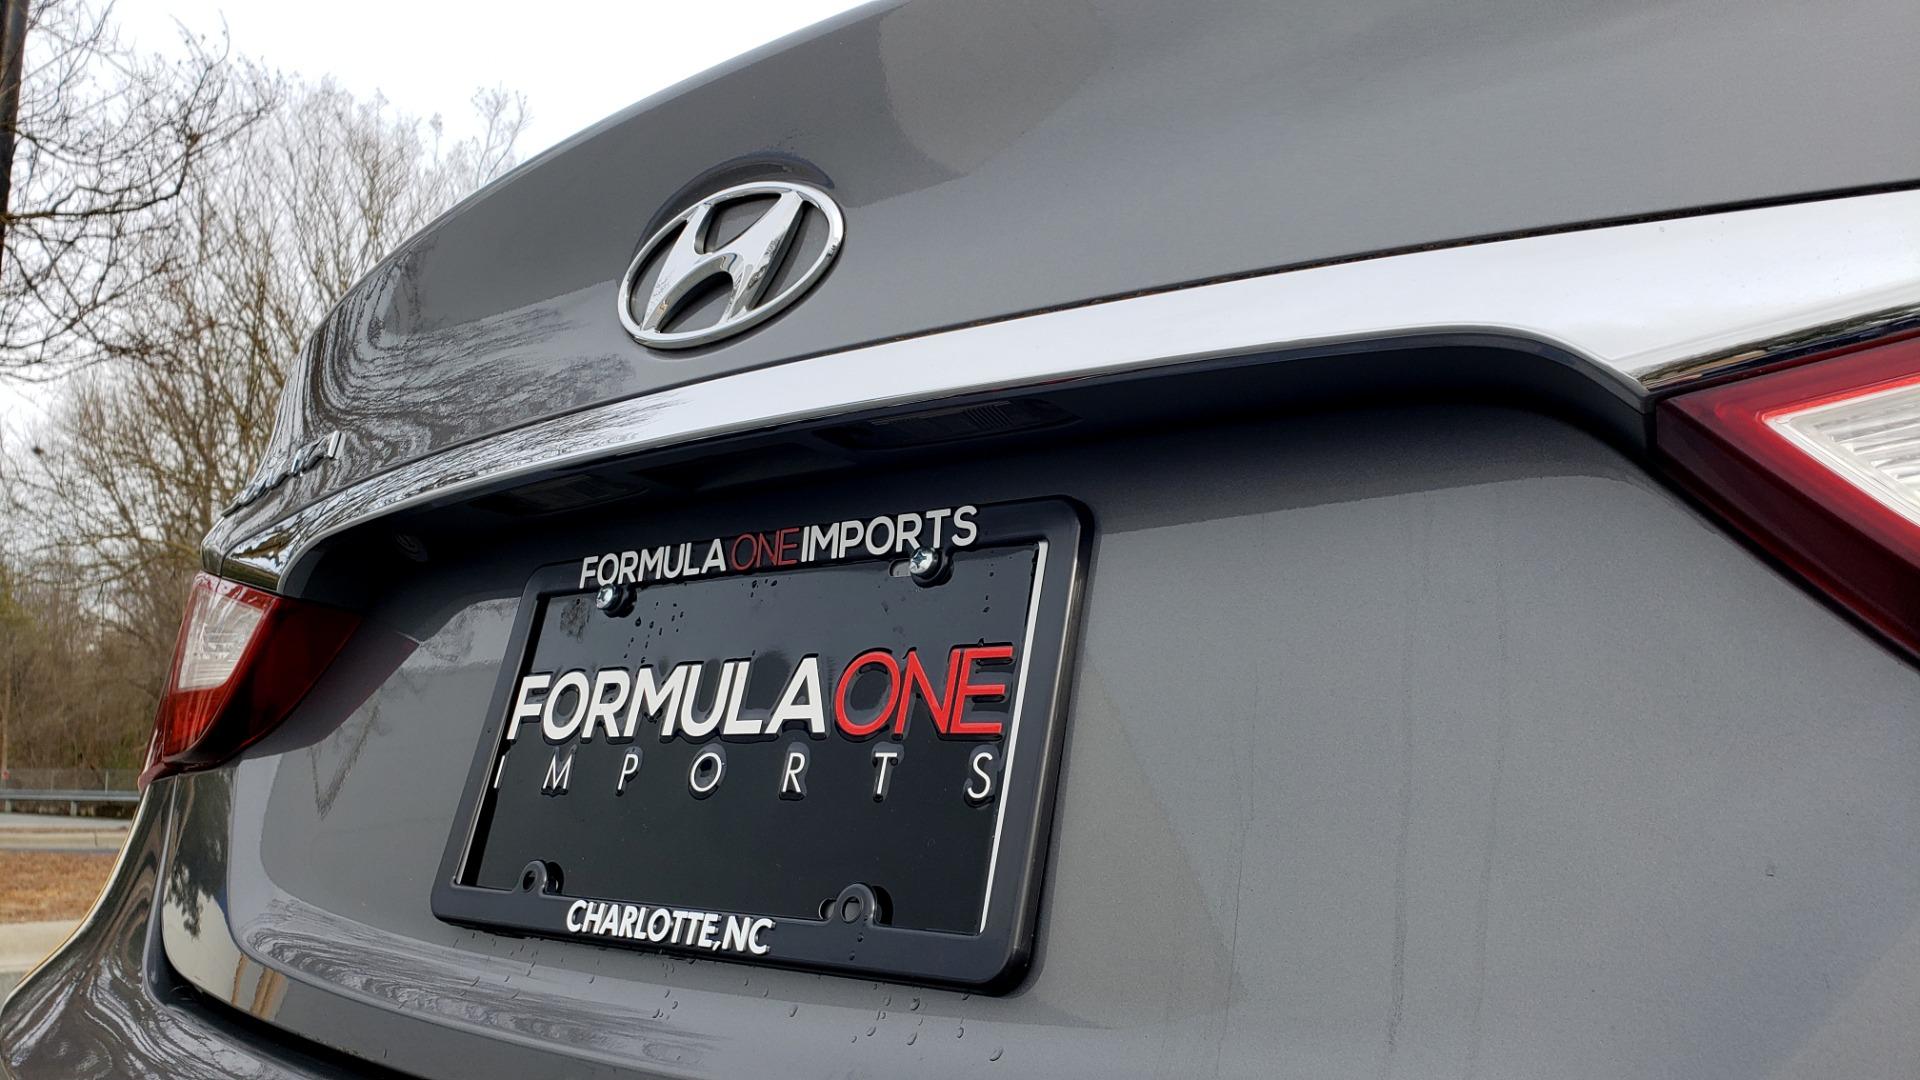 Used 2013 Hyundai SONATA SE AUTO / 2.4L 4-CYL / 6-SPD AUTO / VERY CLEAN for sale Sold at Formula Imports in Charlotte NC 28227 31